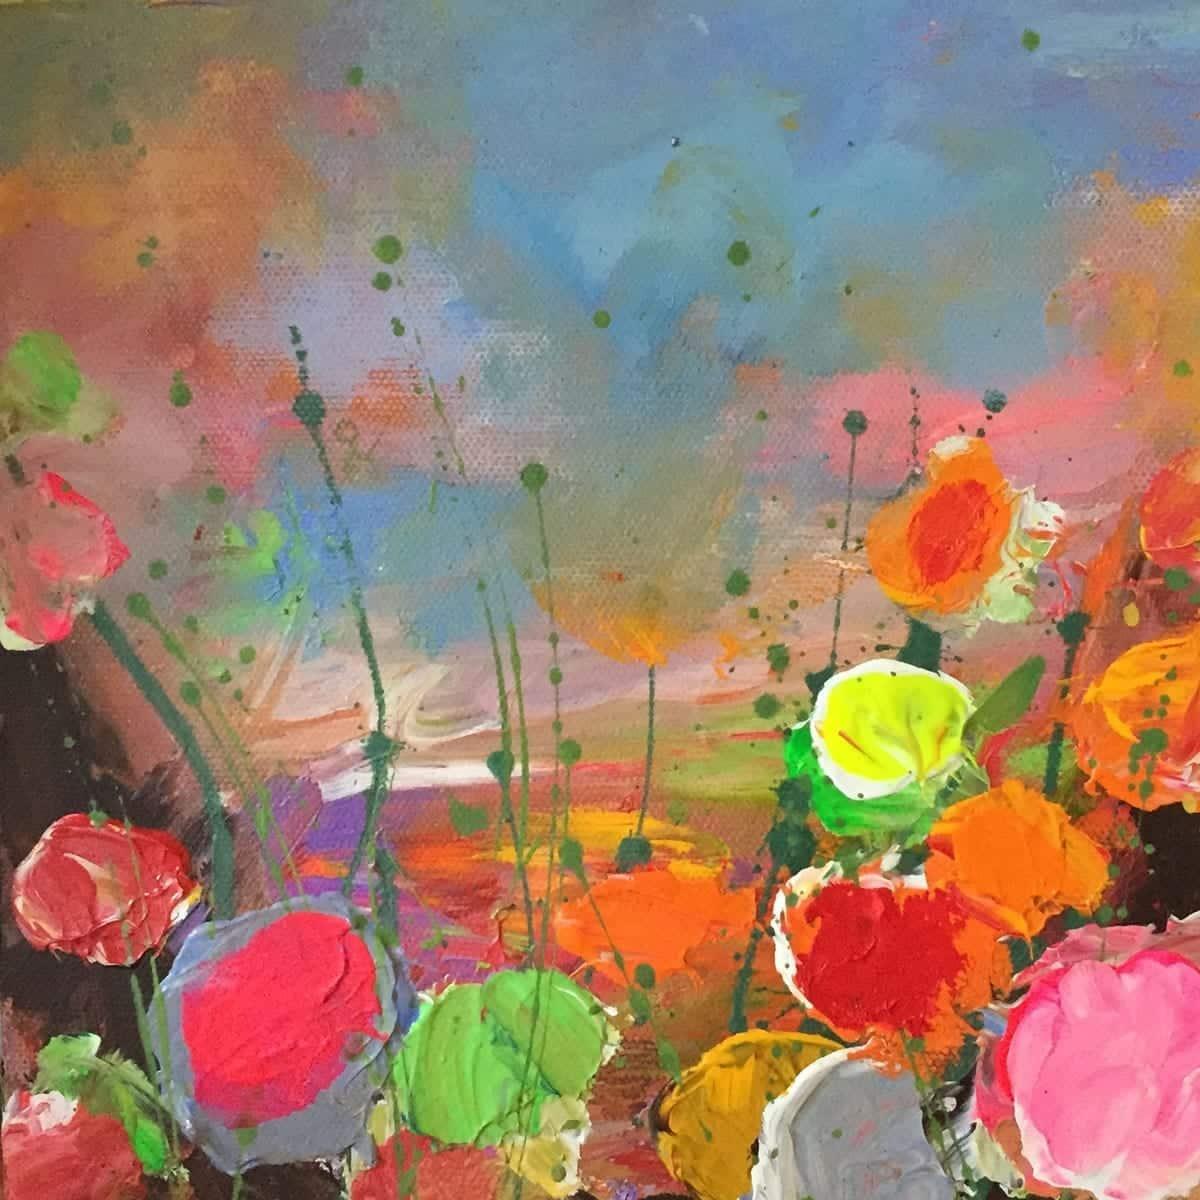 Contemporary Art for Sale - Wild Flower Paintings - 20cm x 20cm 01